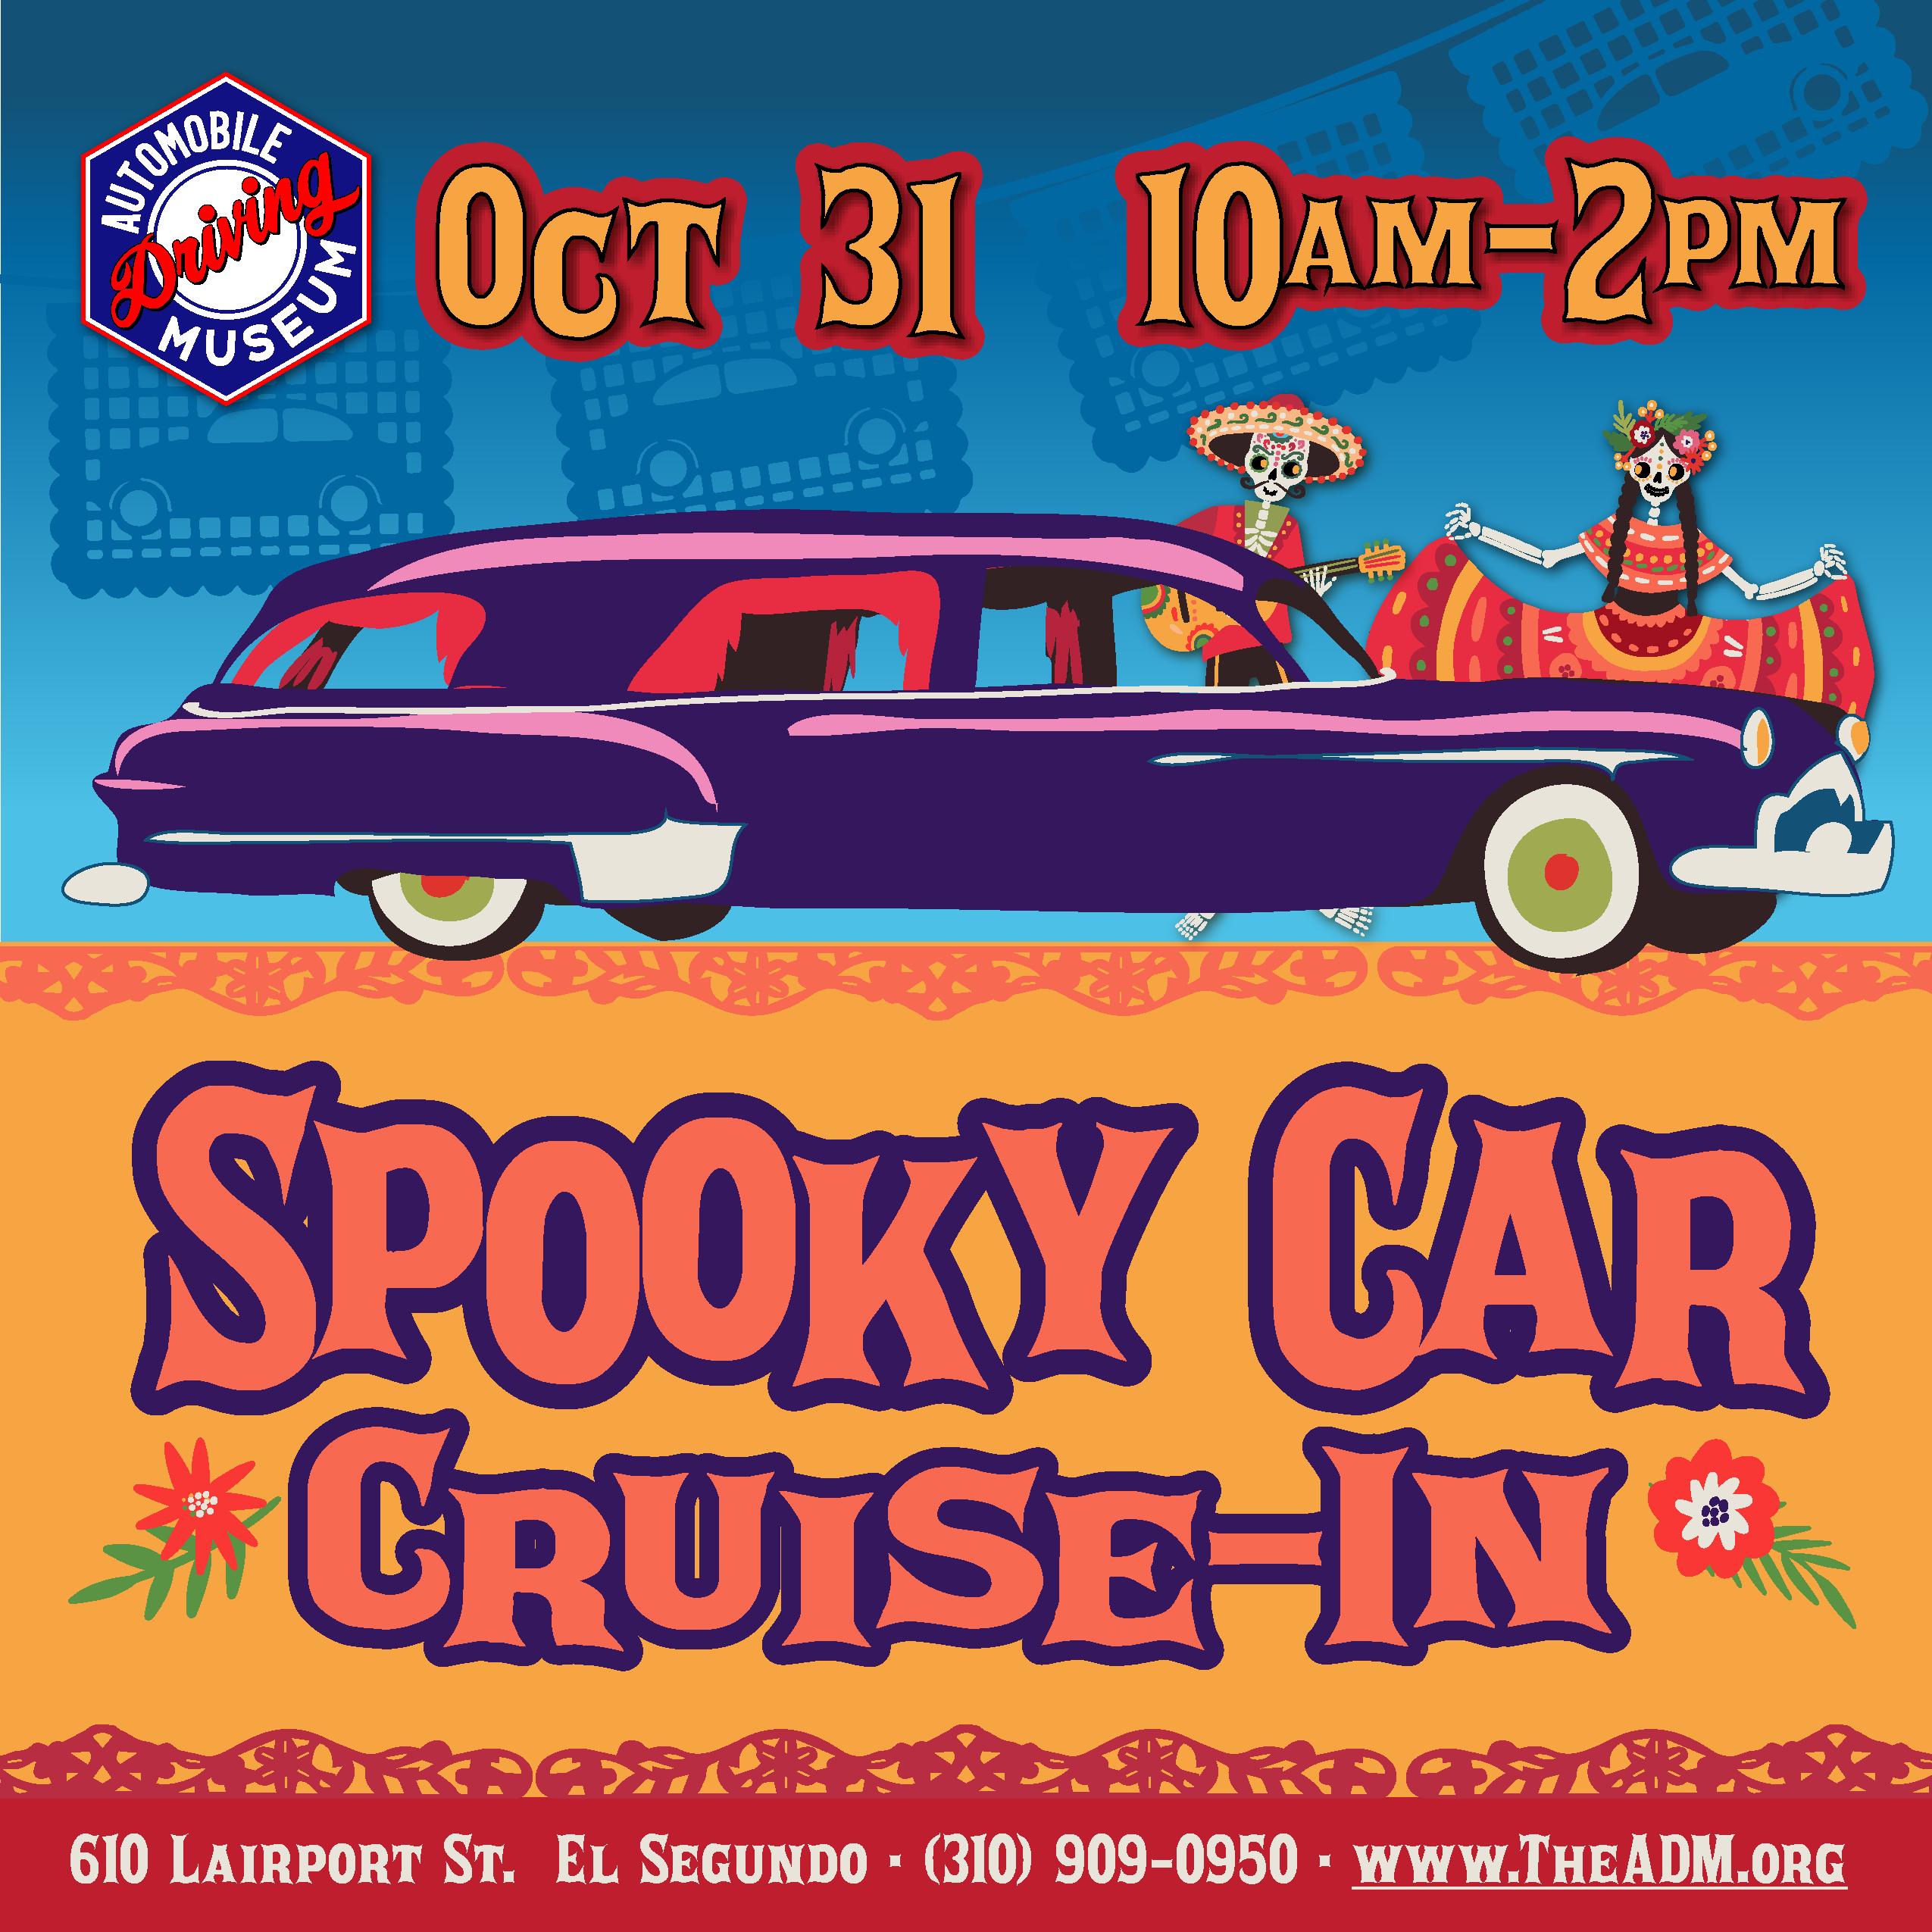 trunk or treat spooky car IG 2021 v2-01